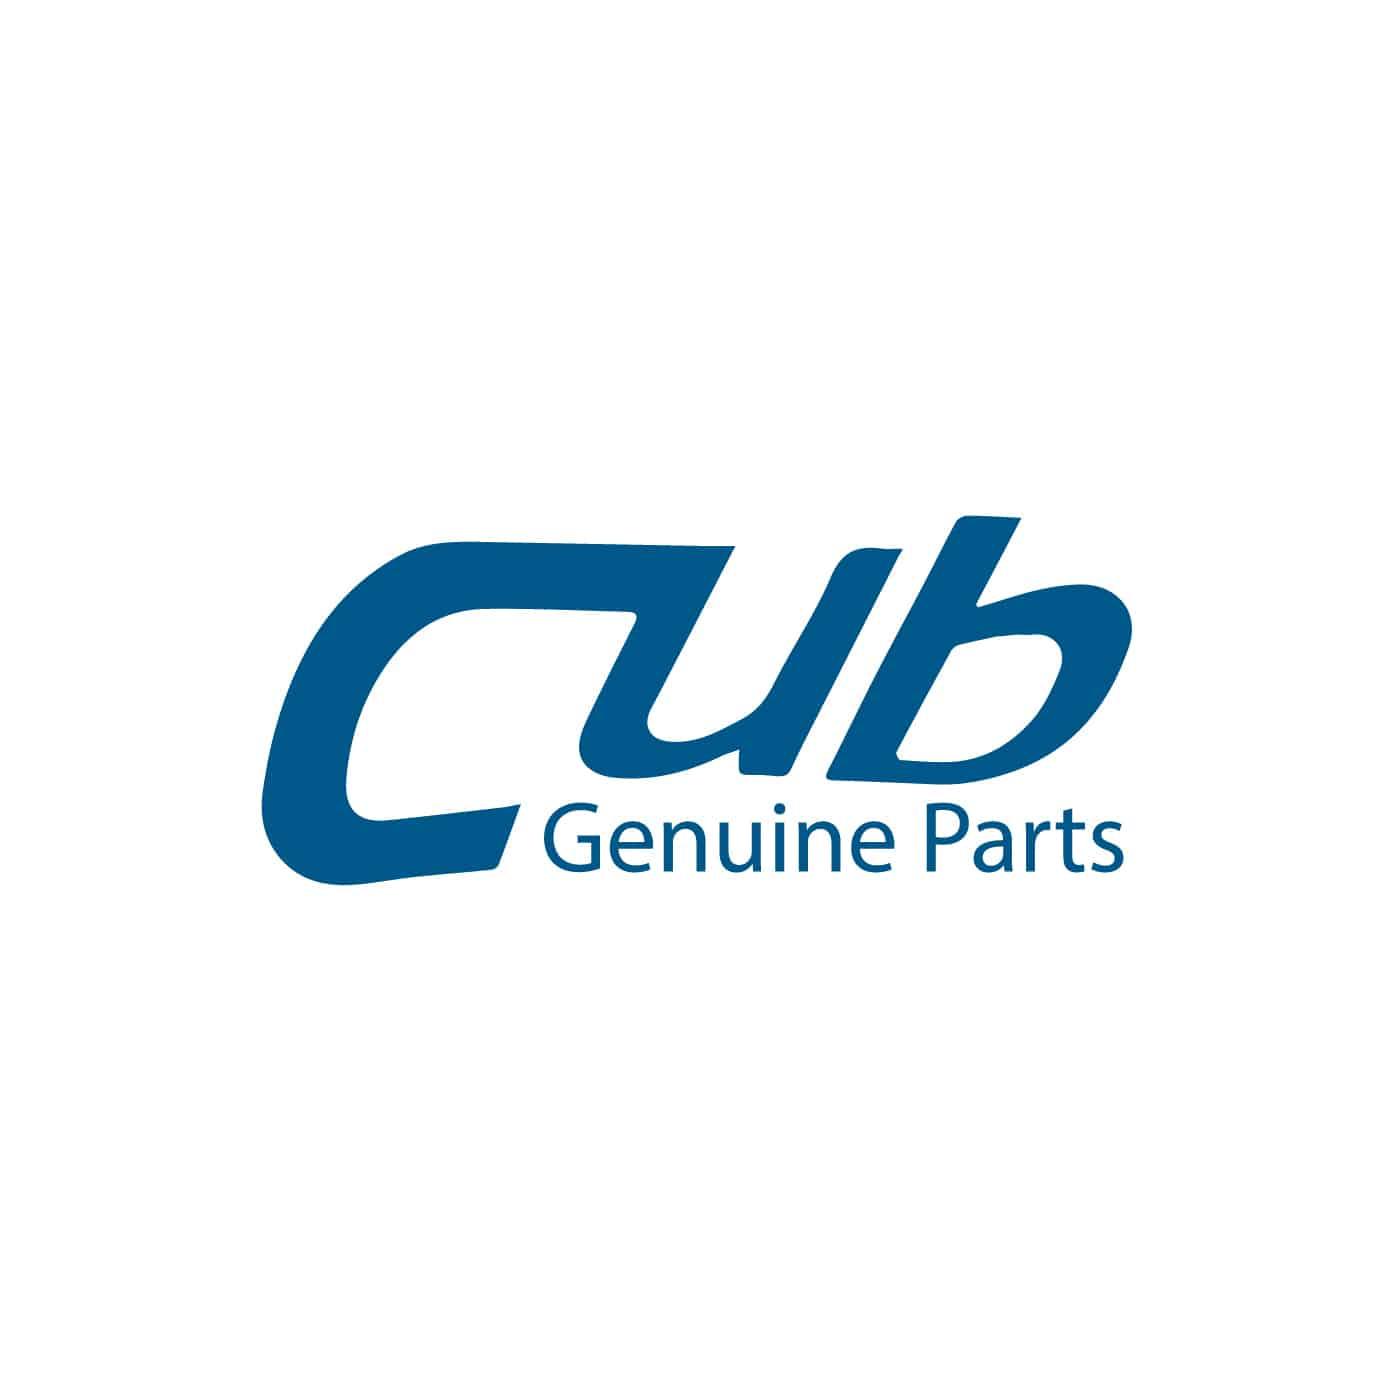 CUB RDKS Logo